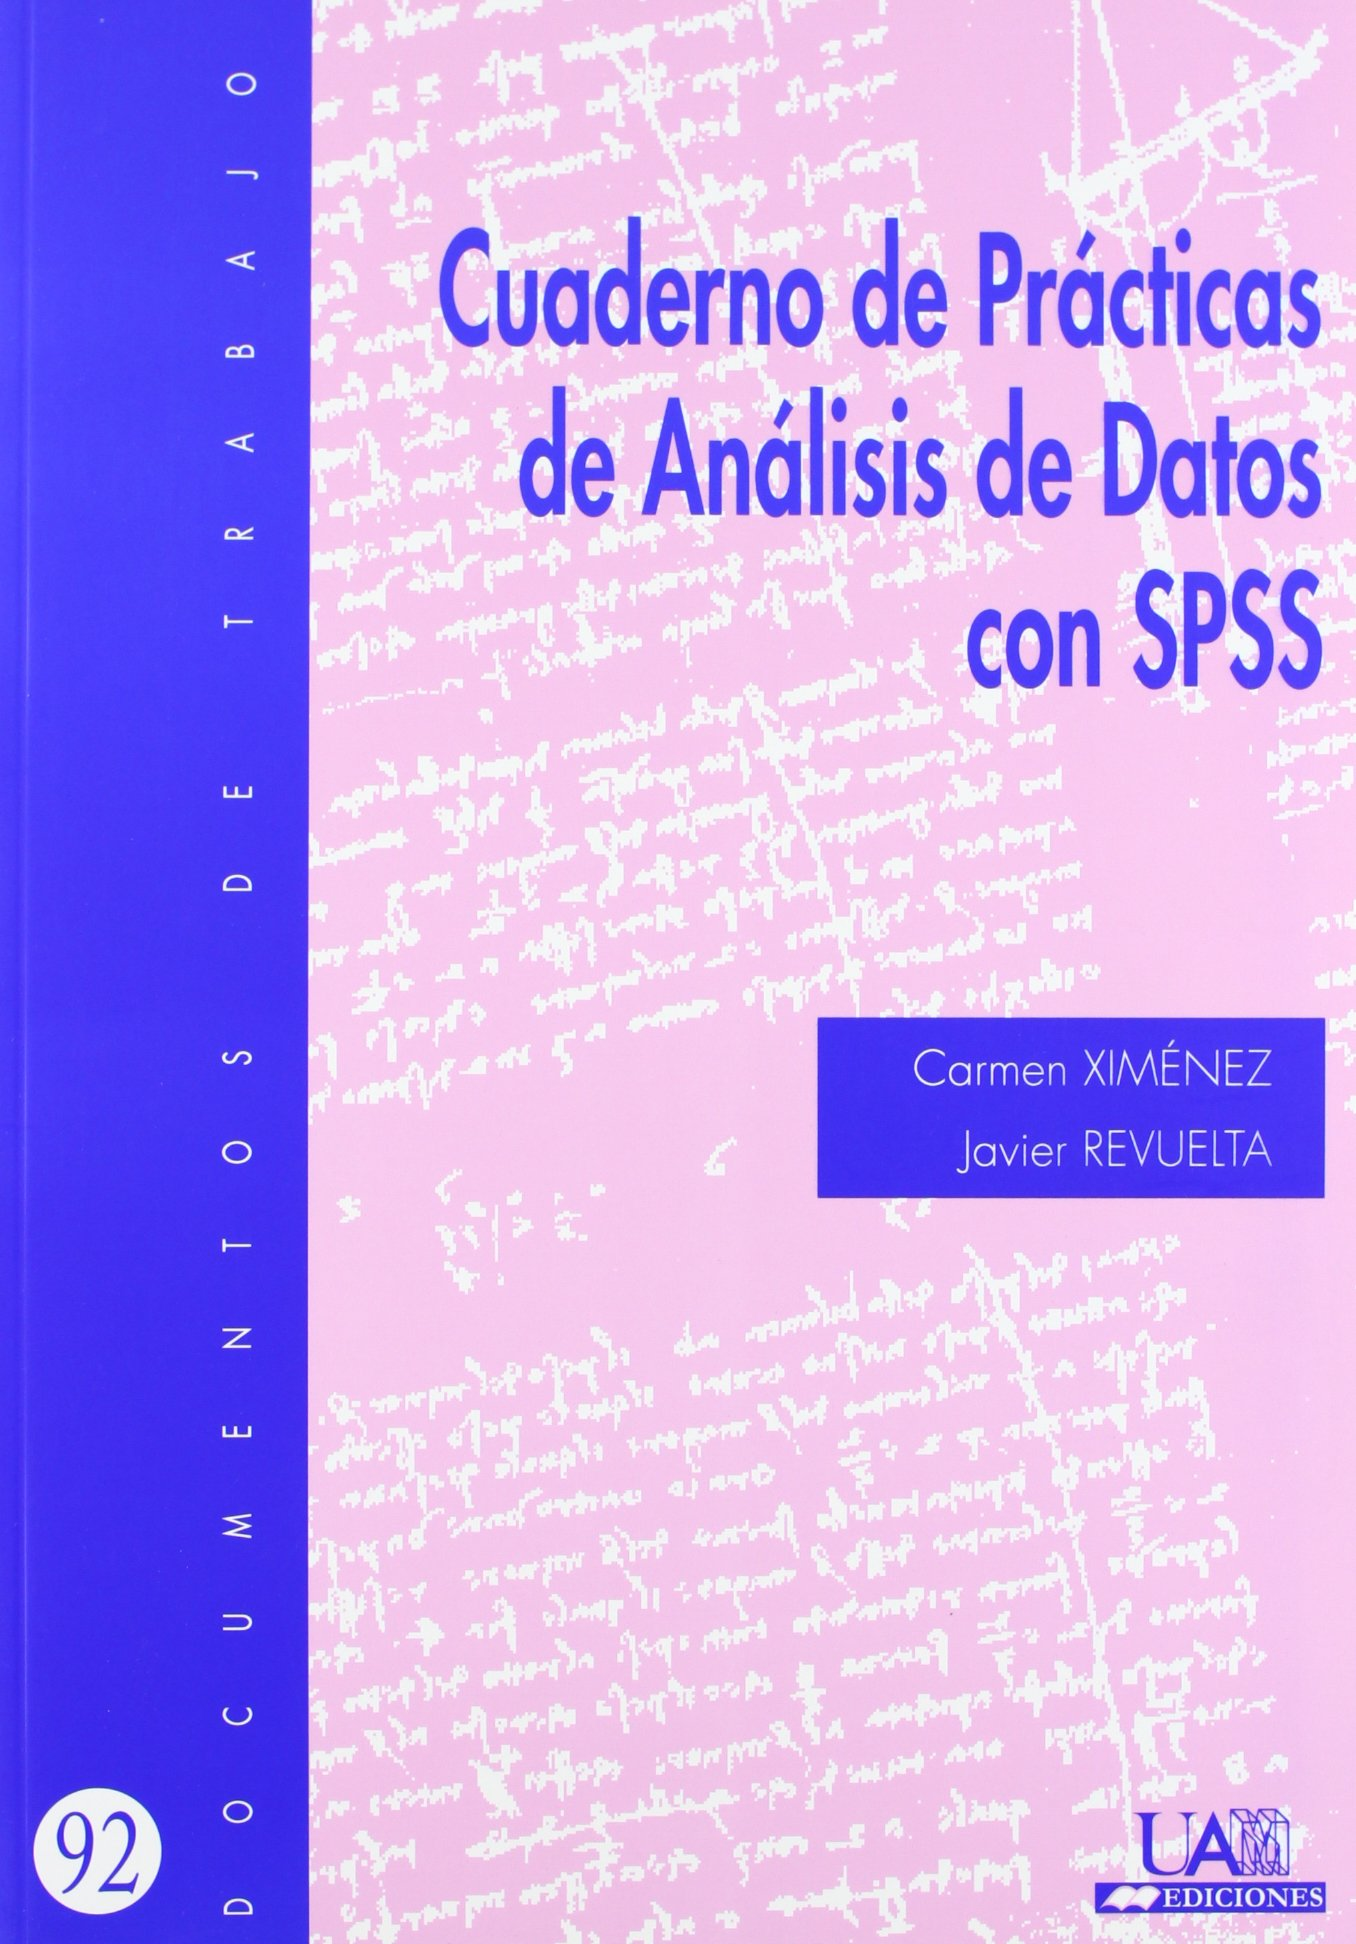 Cuaderno de practicas de análisis de datos con SPSS (Documentos de Trabajo) Tapa blanda – 1 sep 2010 Carmen Ximénez Javier Revuelta 8483442051 Databases